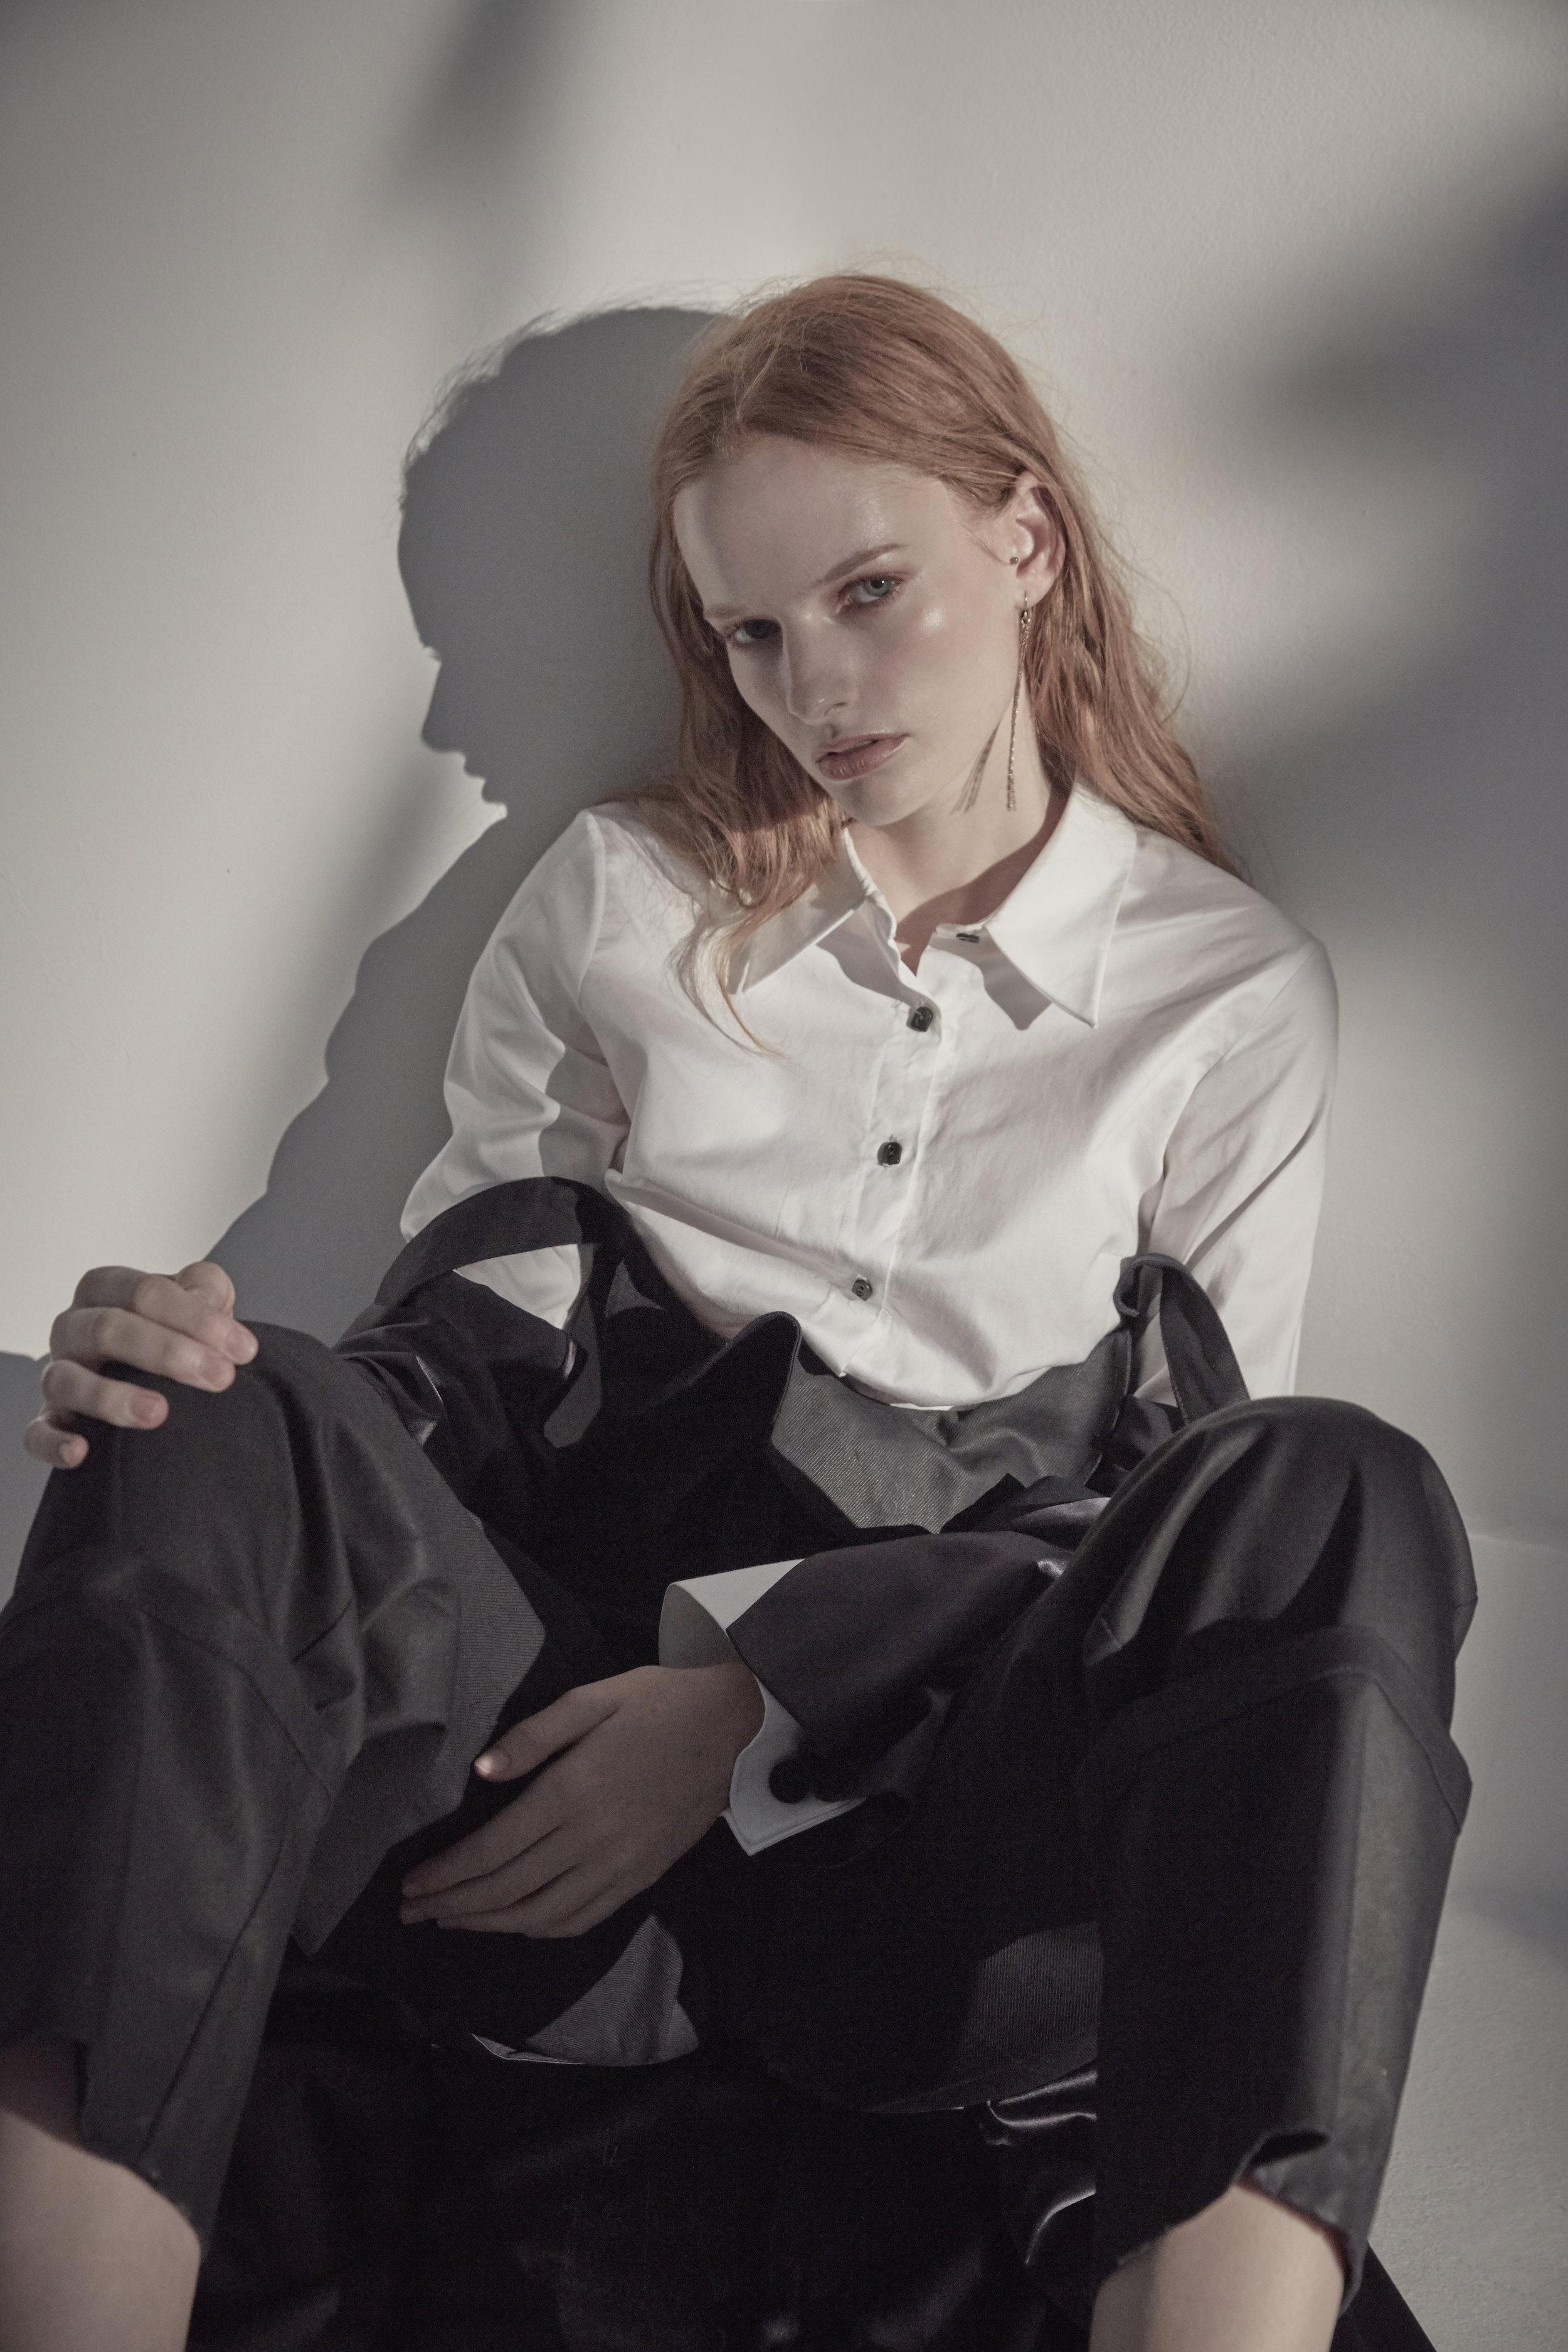 Shirt: OSMAN Trousers: TEIJA Coat: JACOON Shoes: MELISSA Pierce: MIRABELLE